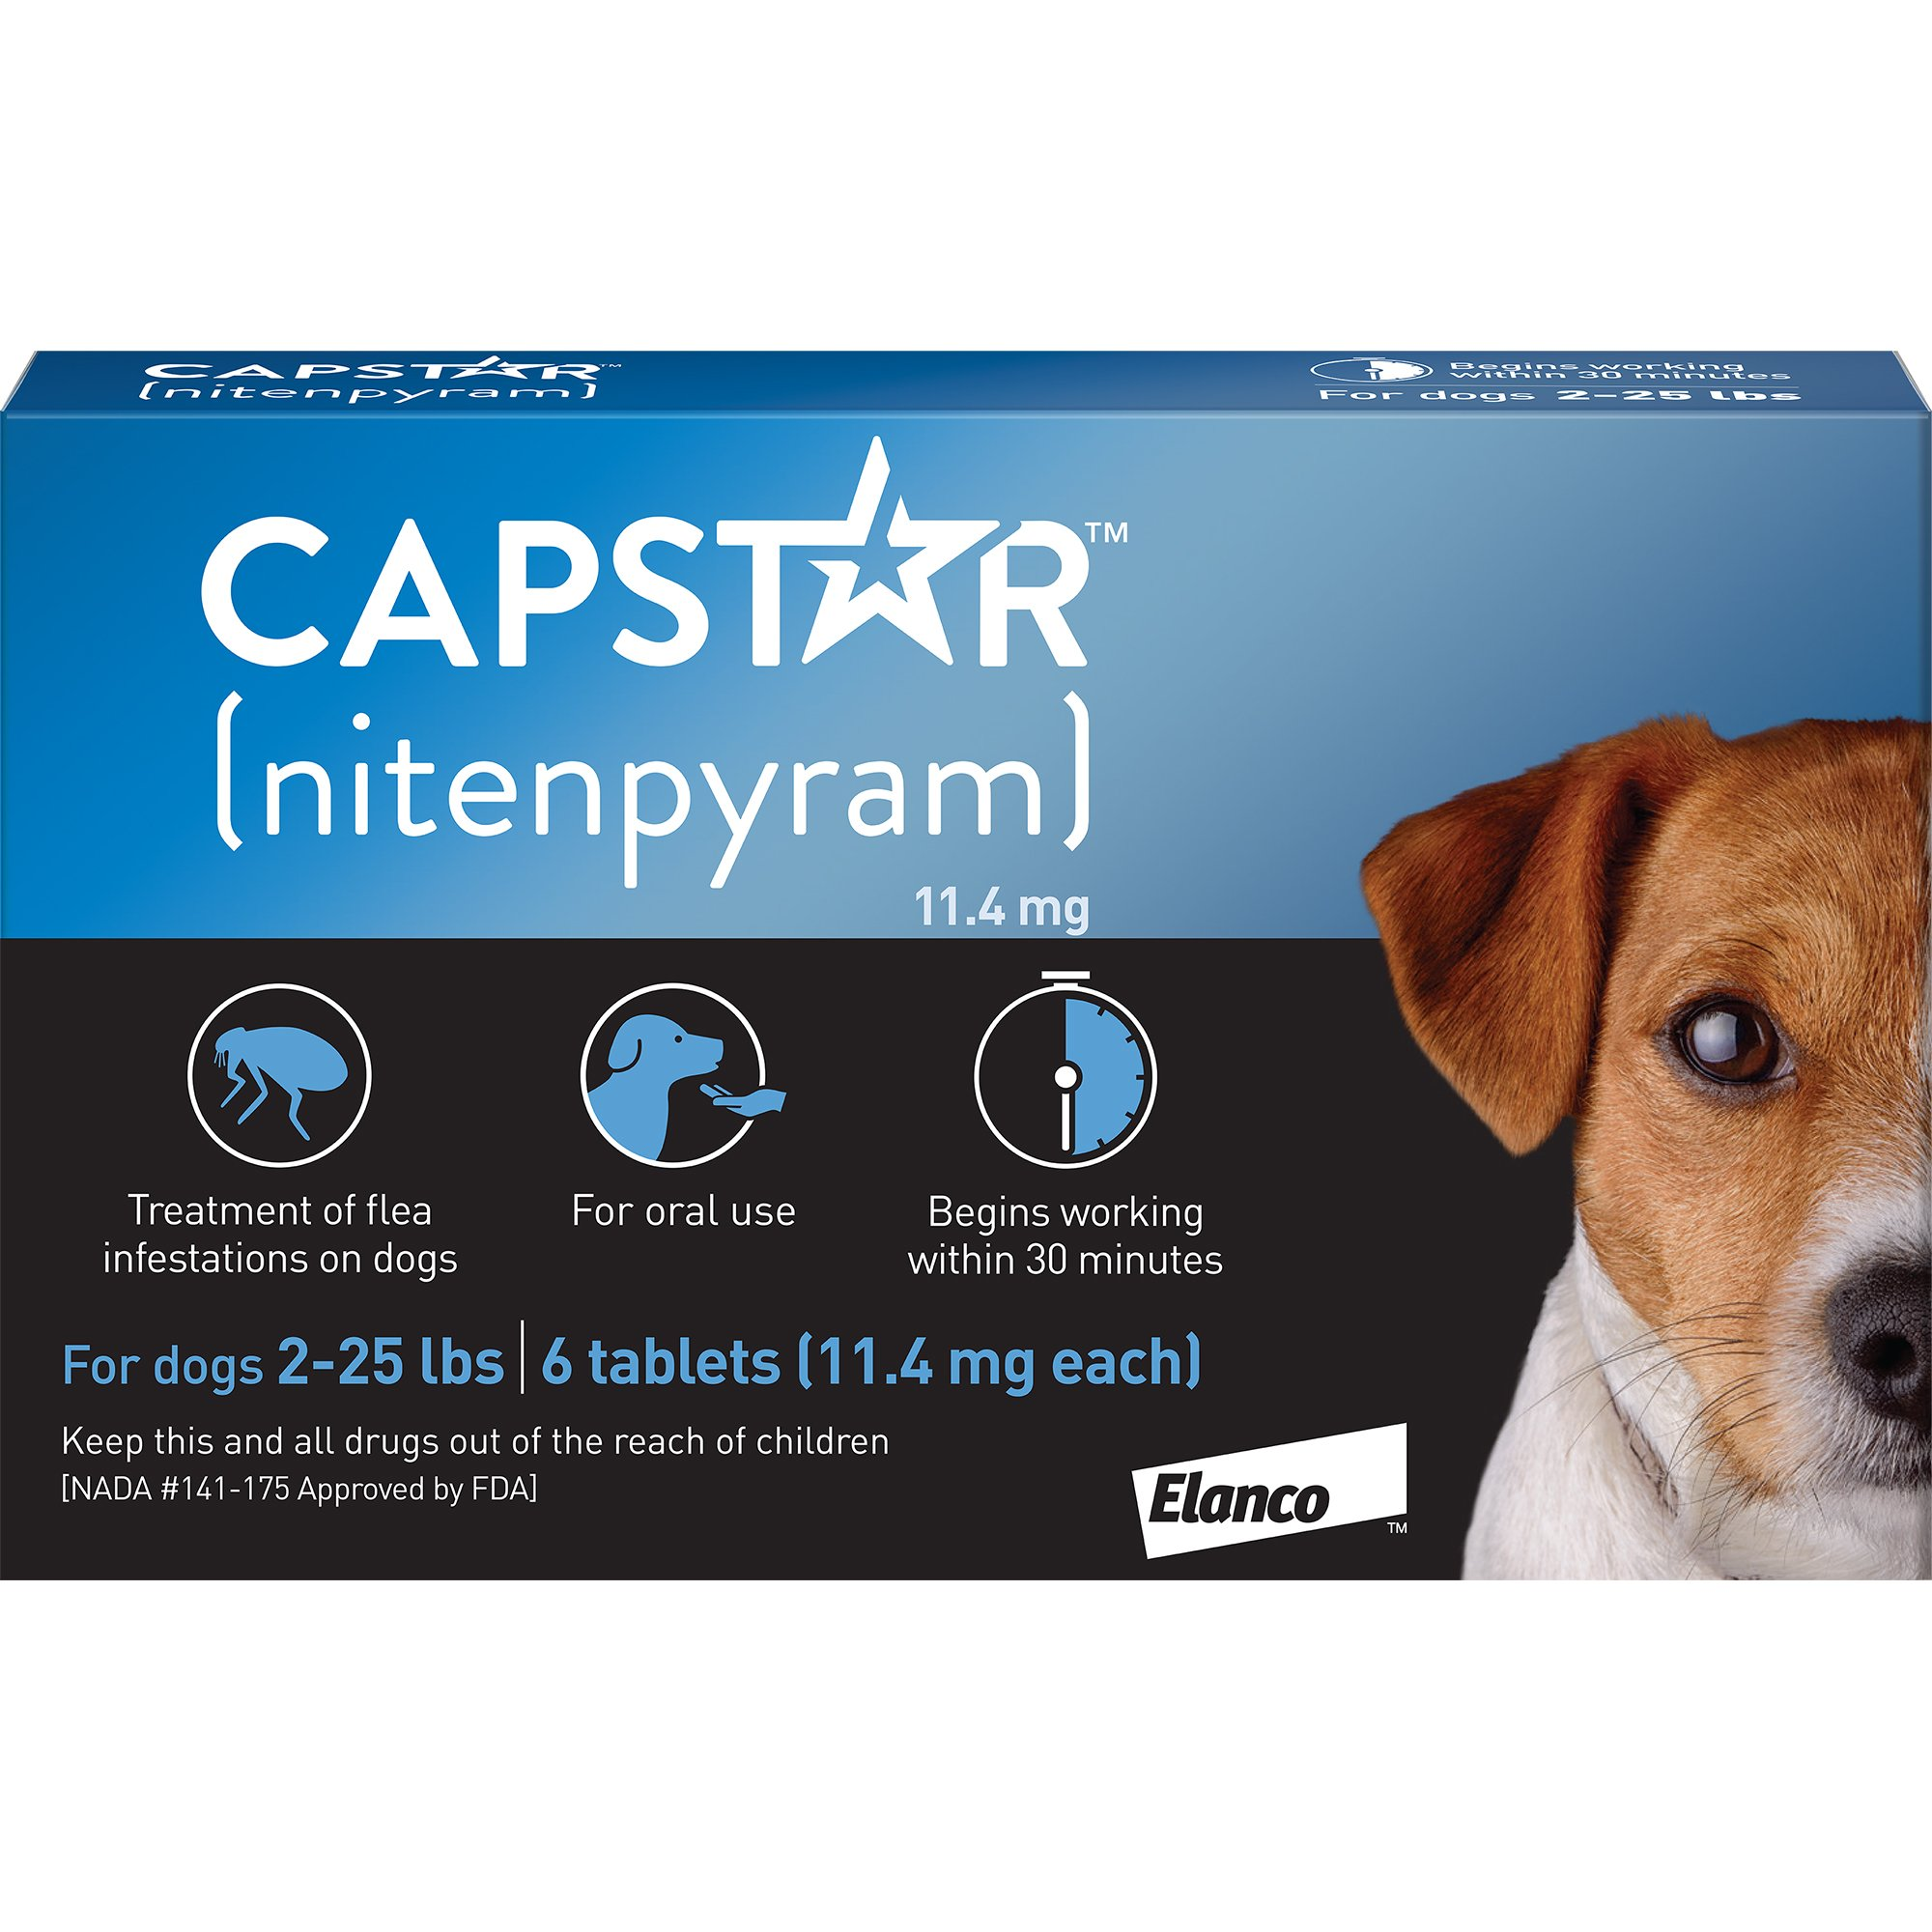 Capstar Flea Tablets For Dogs 2 25 Lbs Count Of 6 Flea Treatment Fleas Dogs